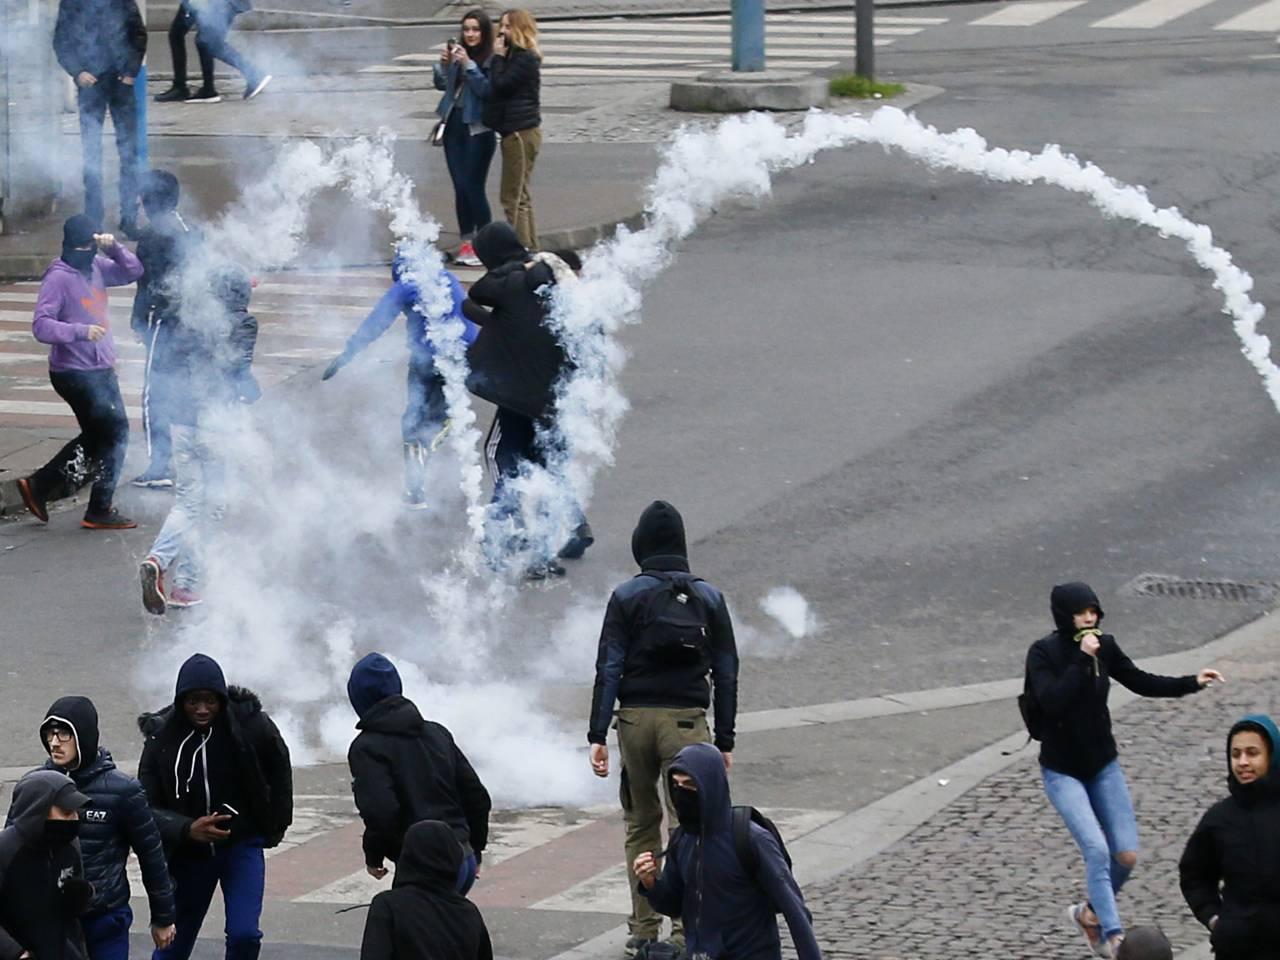 Fresh protests erupt in France over alleged police brutality leading to arrests